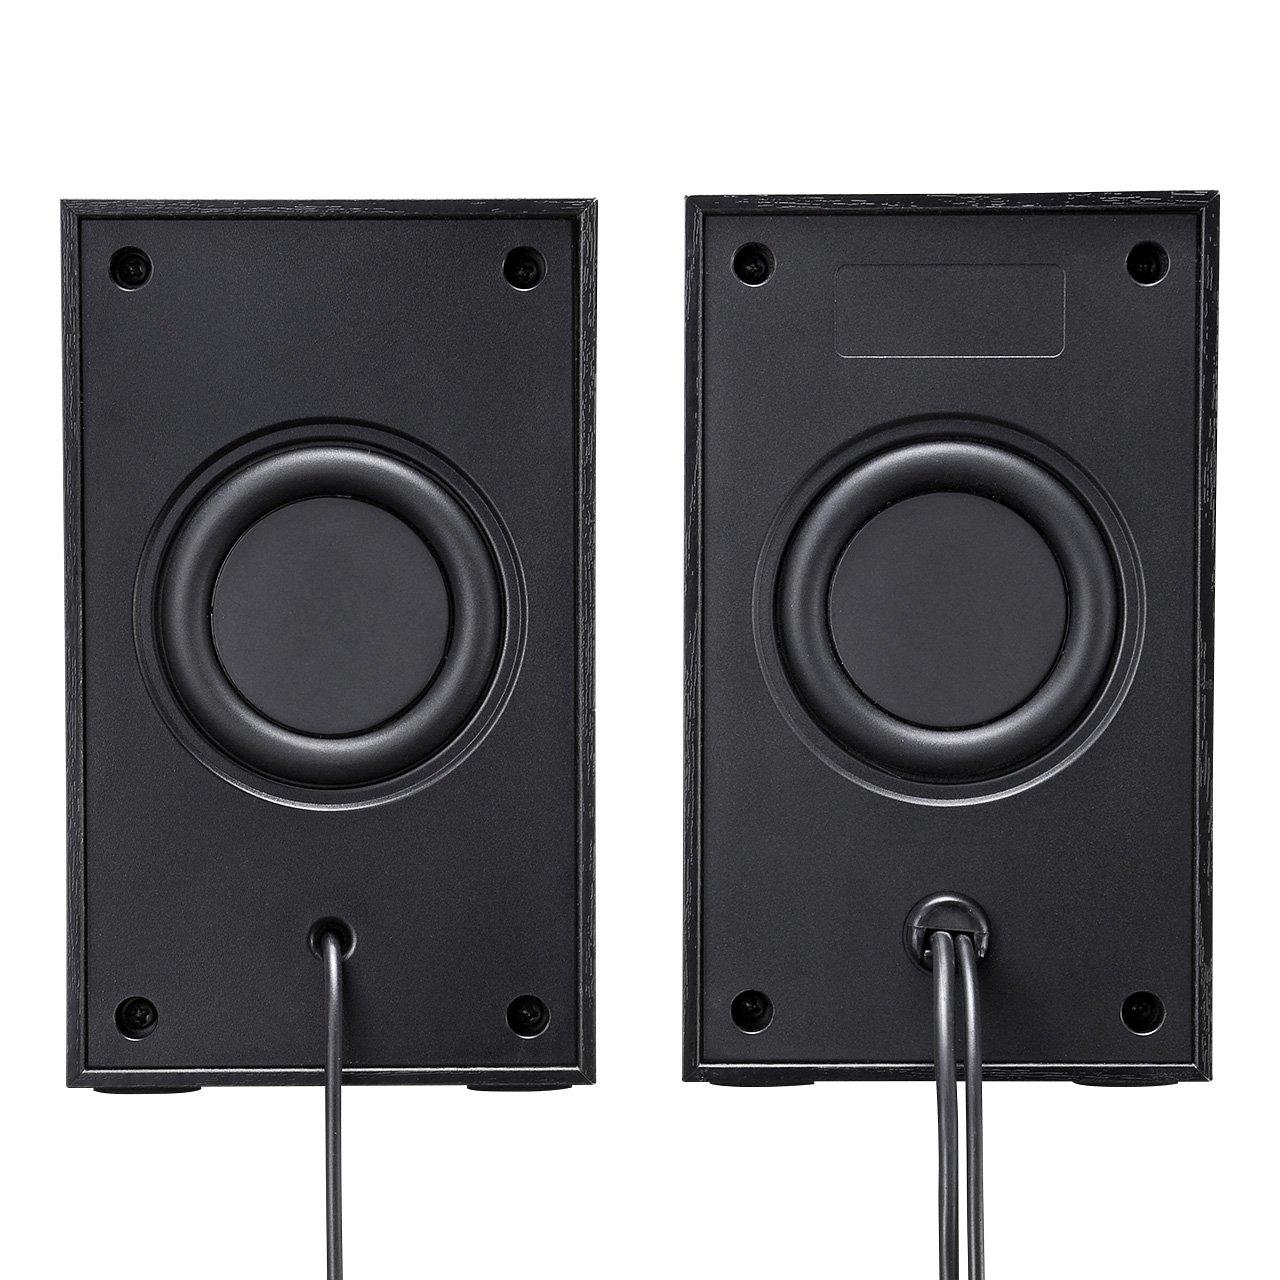 SANWA SUPPLY high-power USB speaker MM-SPU9BK (Black) by Sanwa (Image #9)